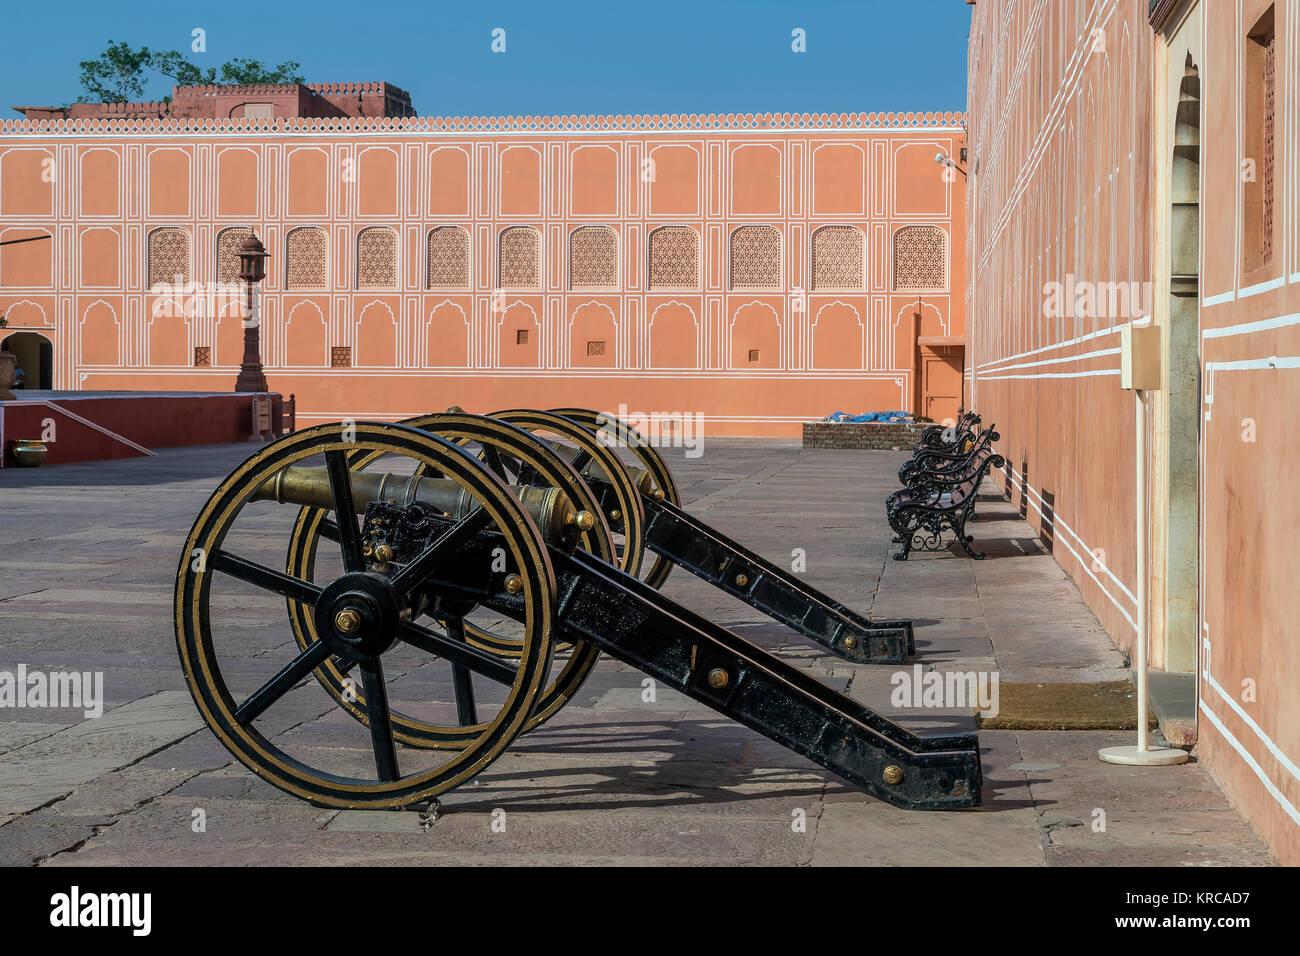 Cannons inside Jaipur City Palace, Rajasthan, India - Stock Image